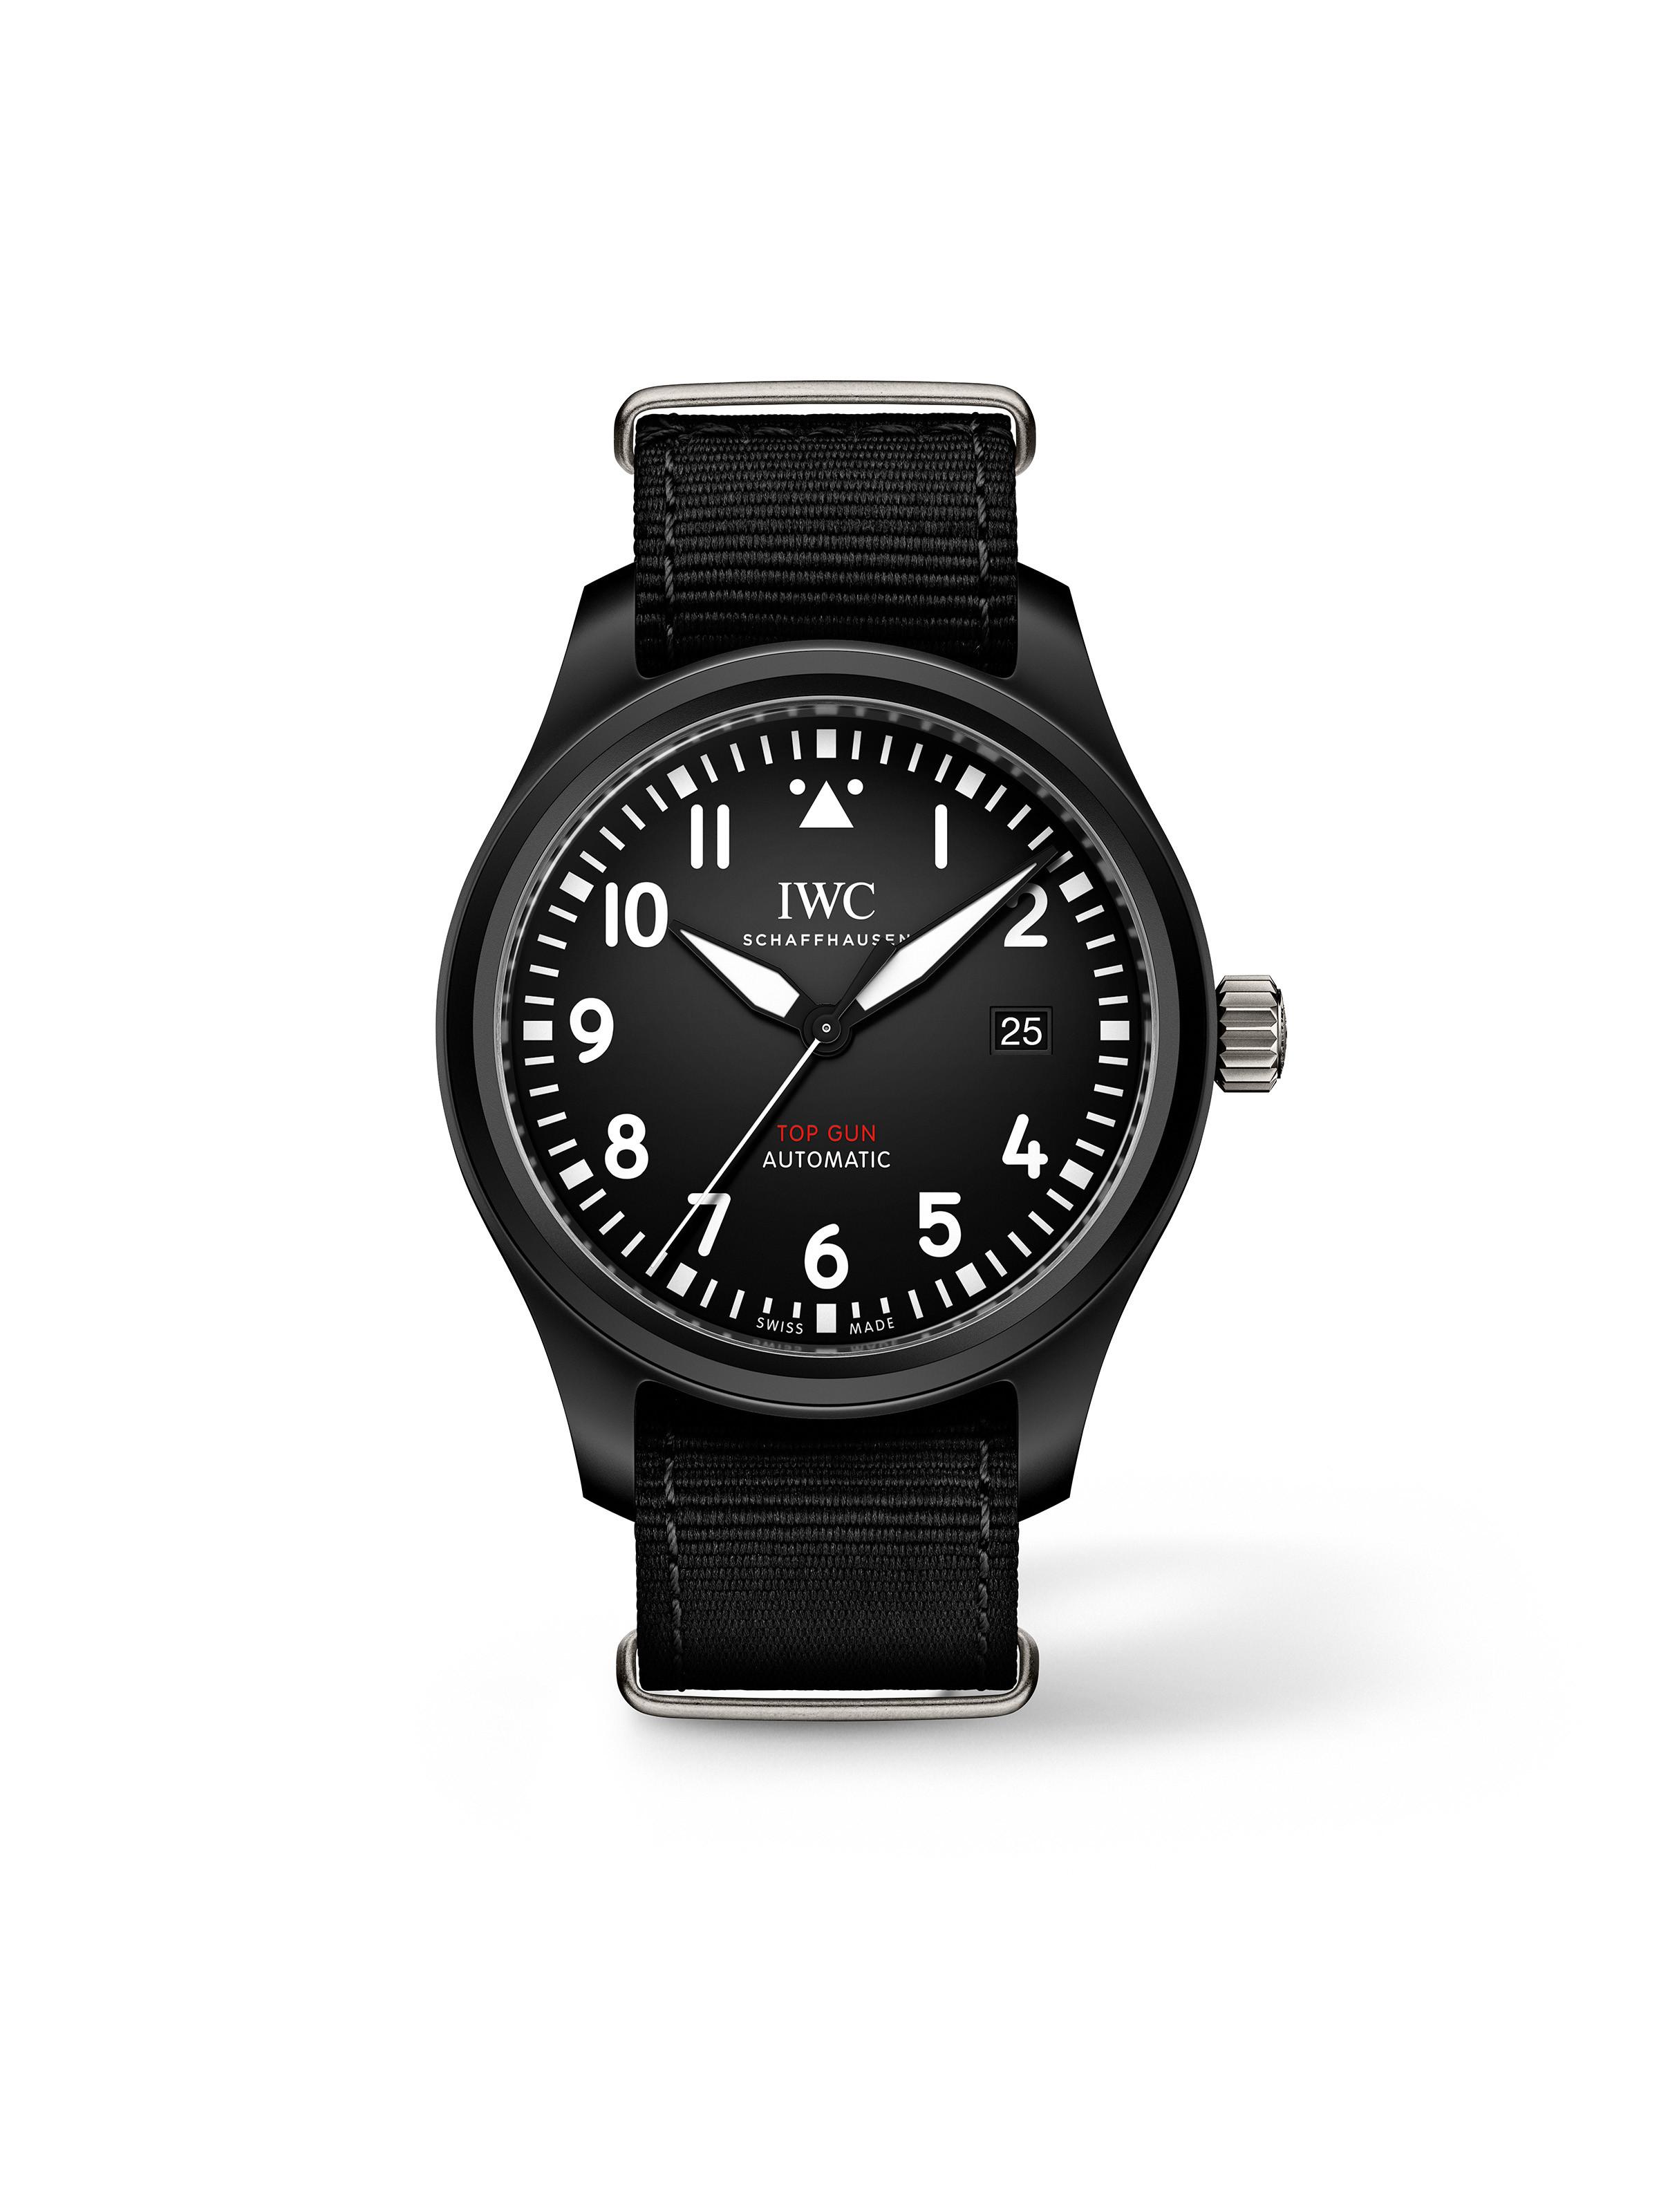 Pilot's Watch Automatic Top Gun